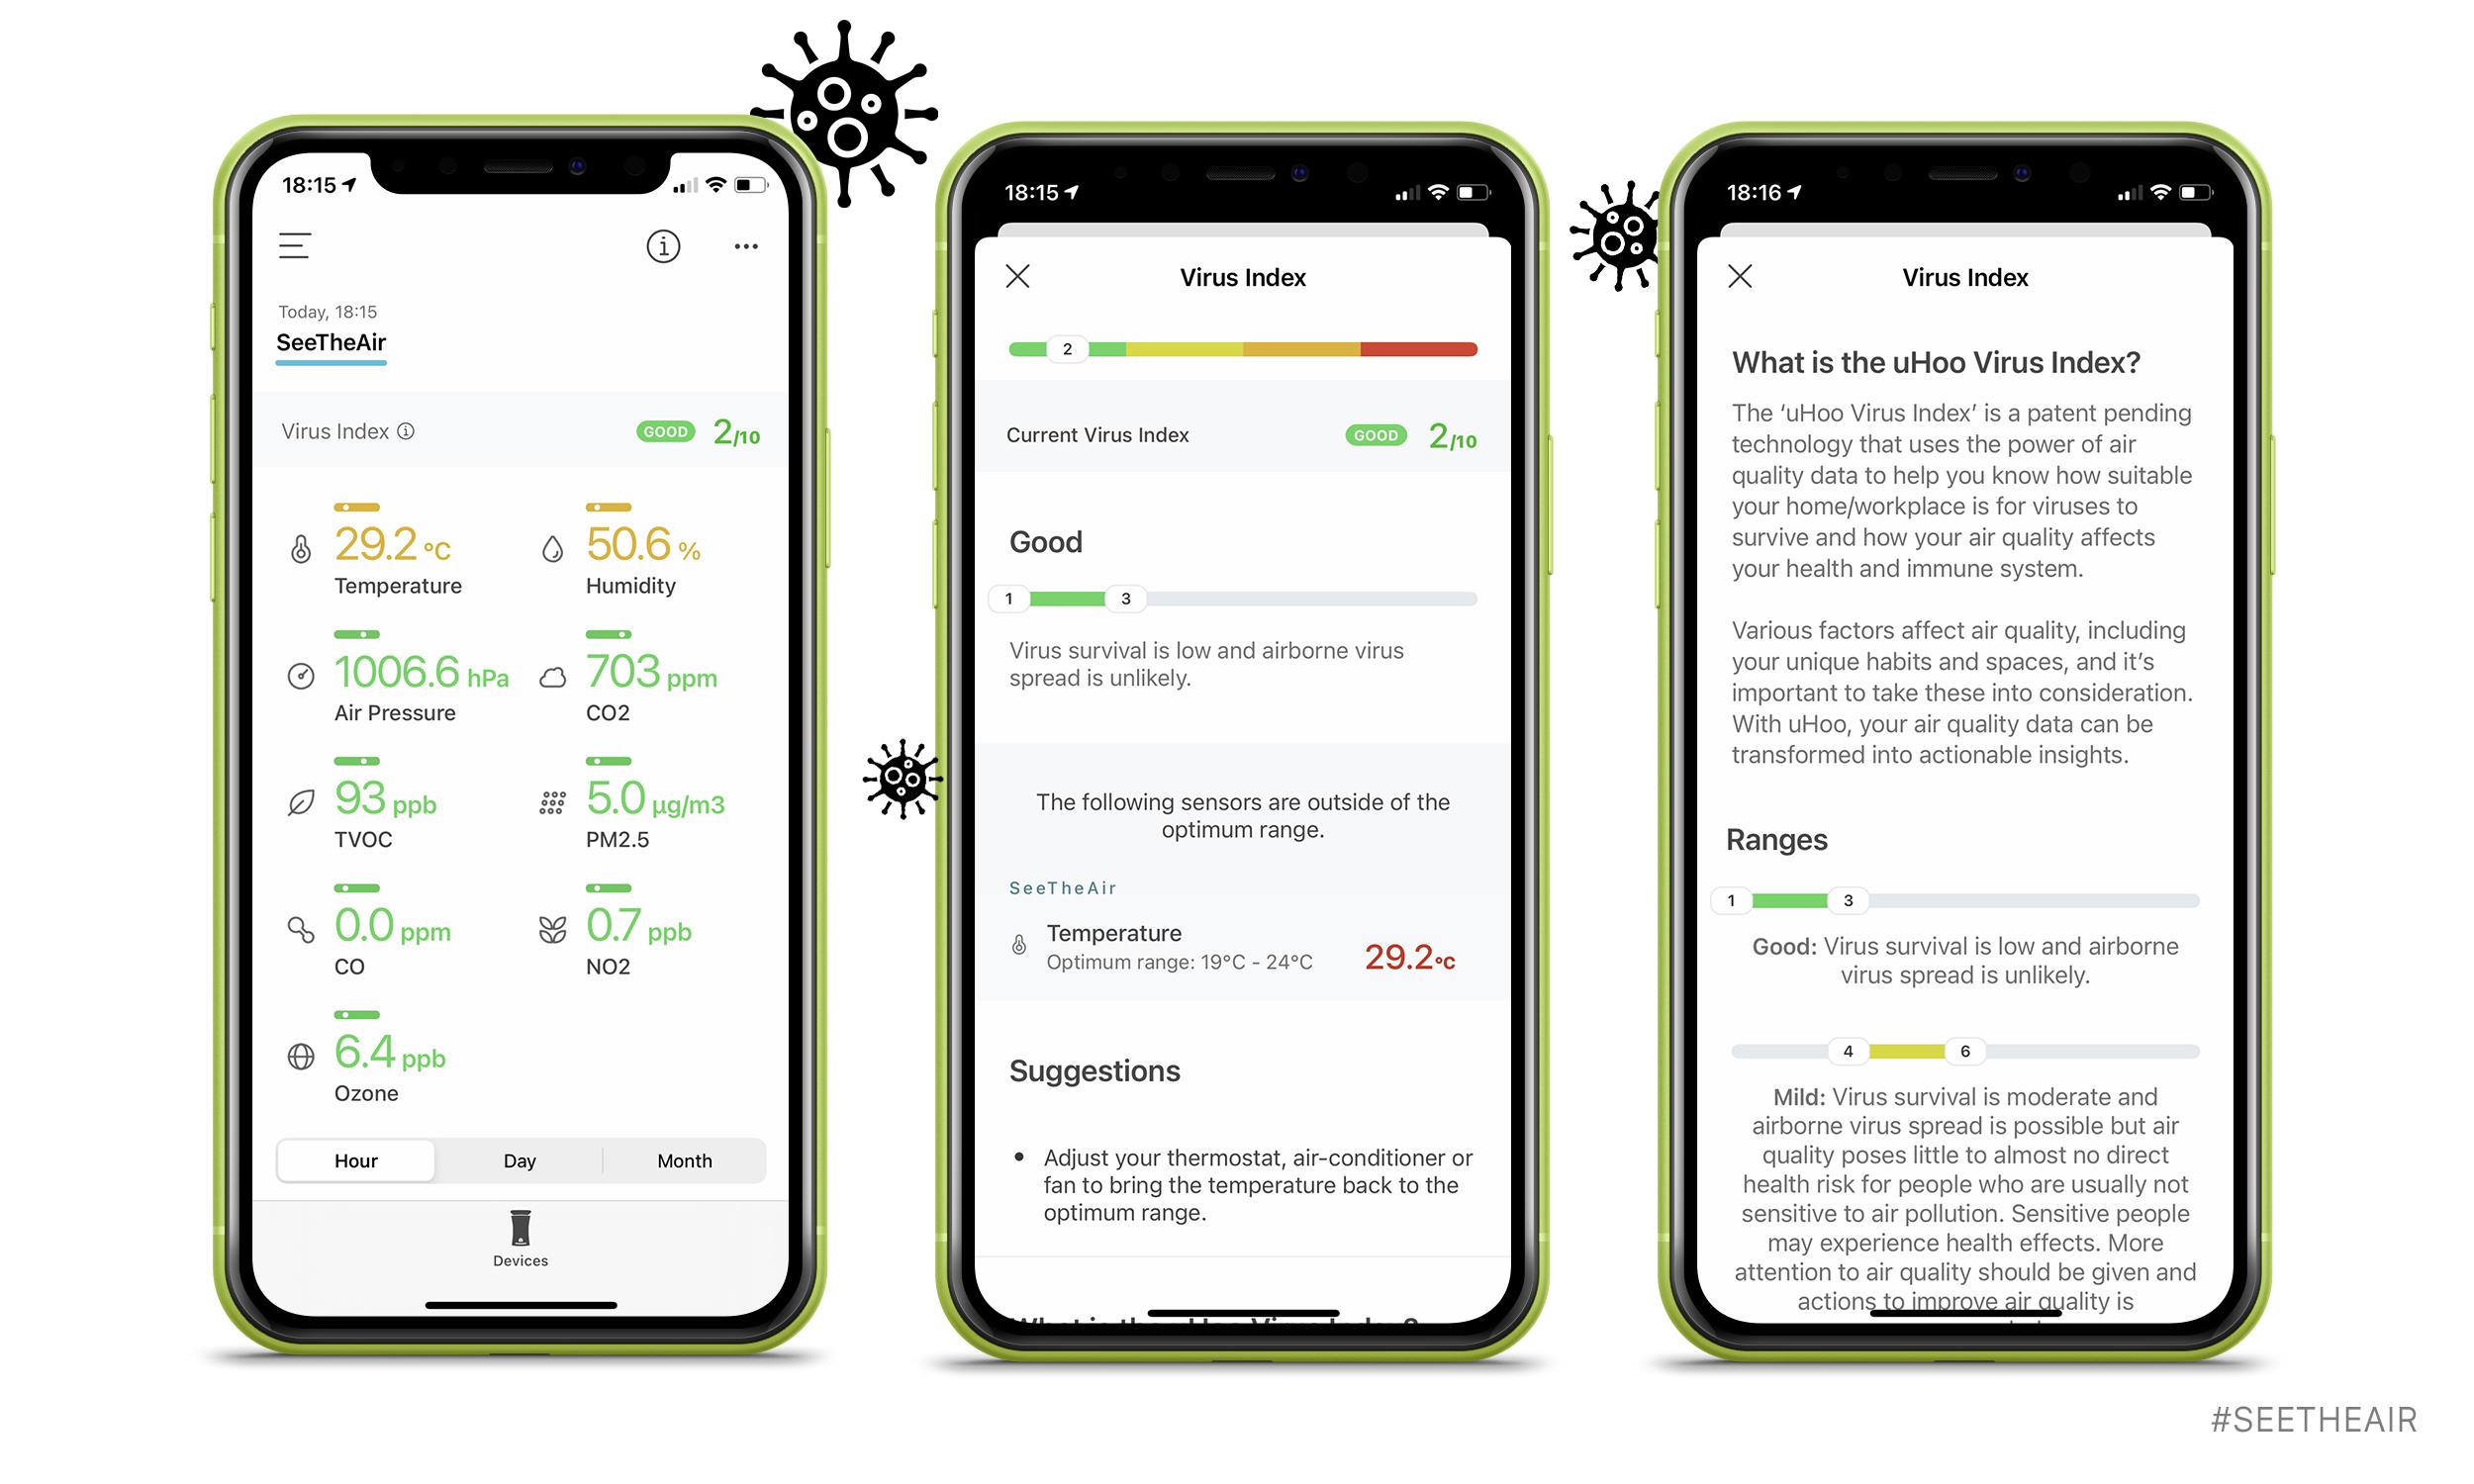 uhoo app 2020 virus index